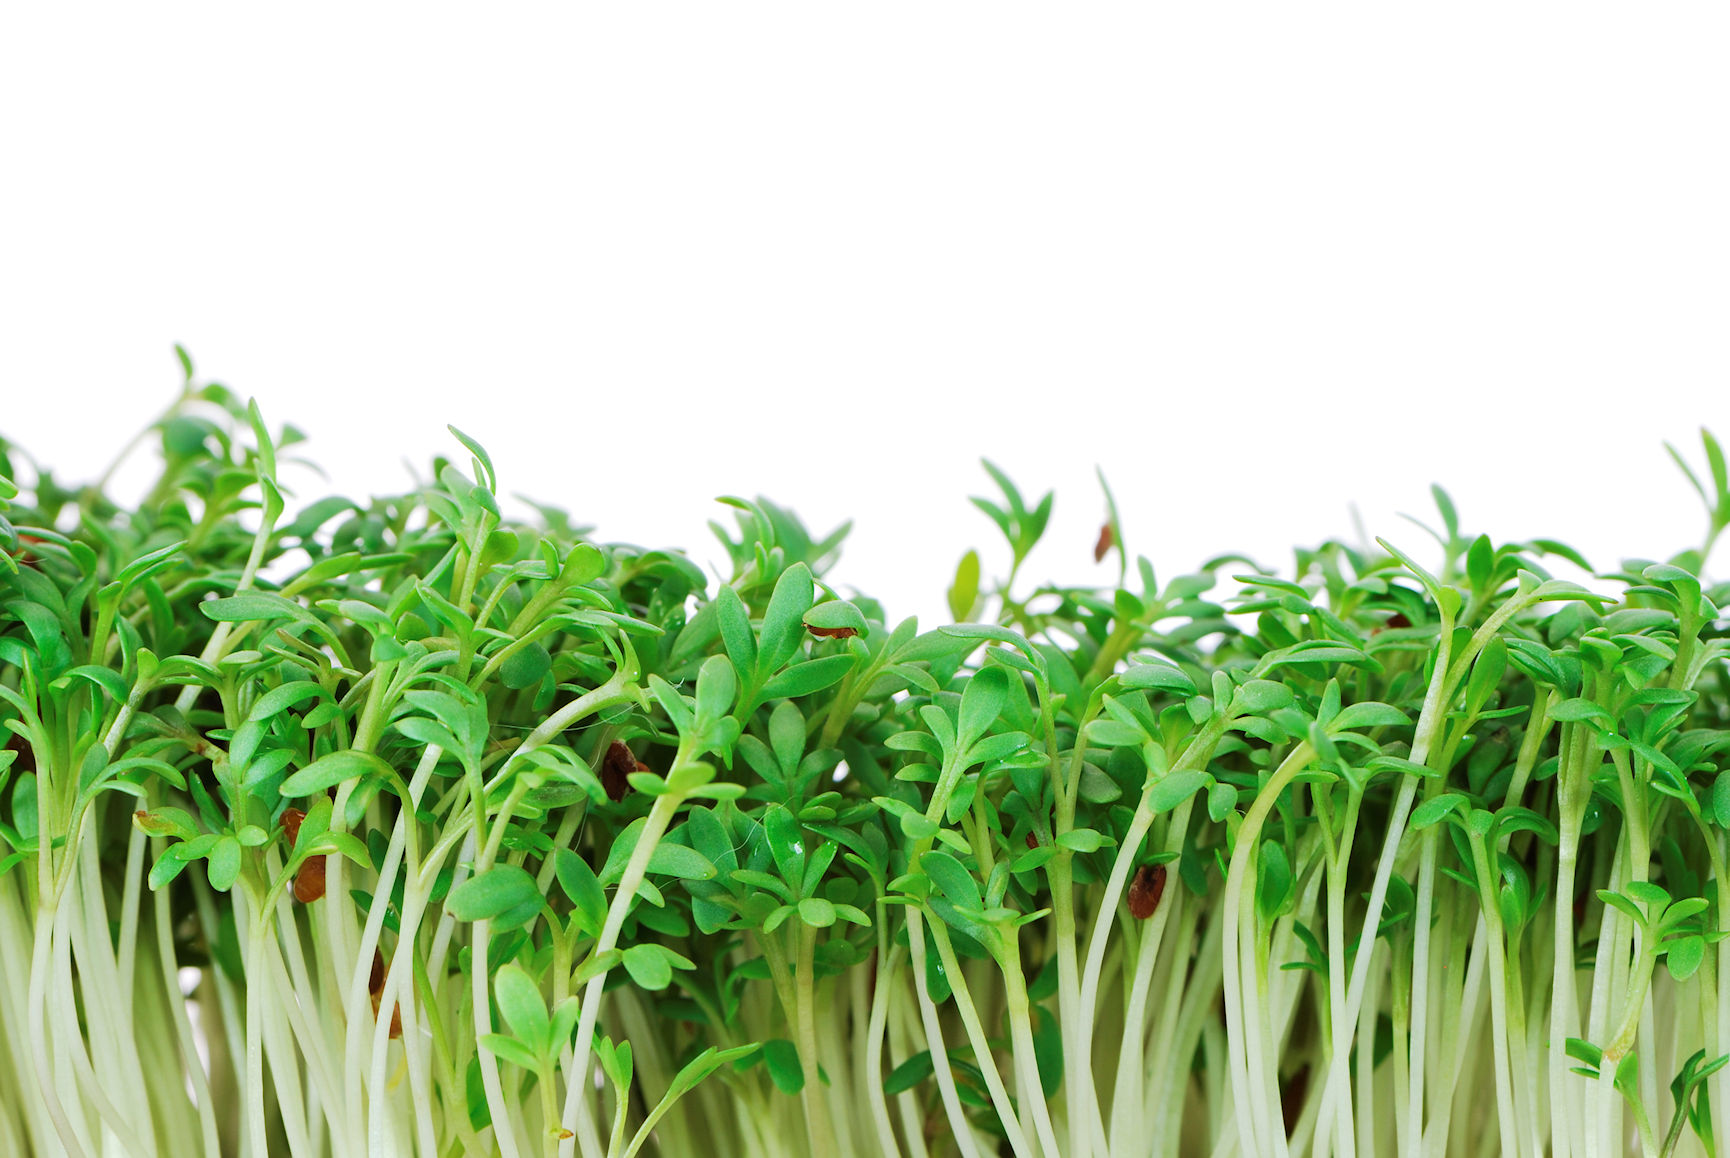 Growing Food Indoors